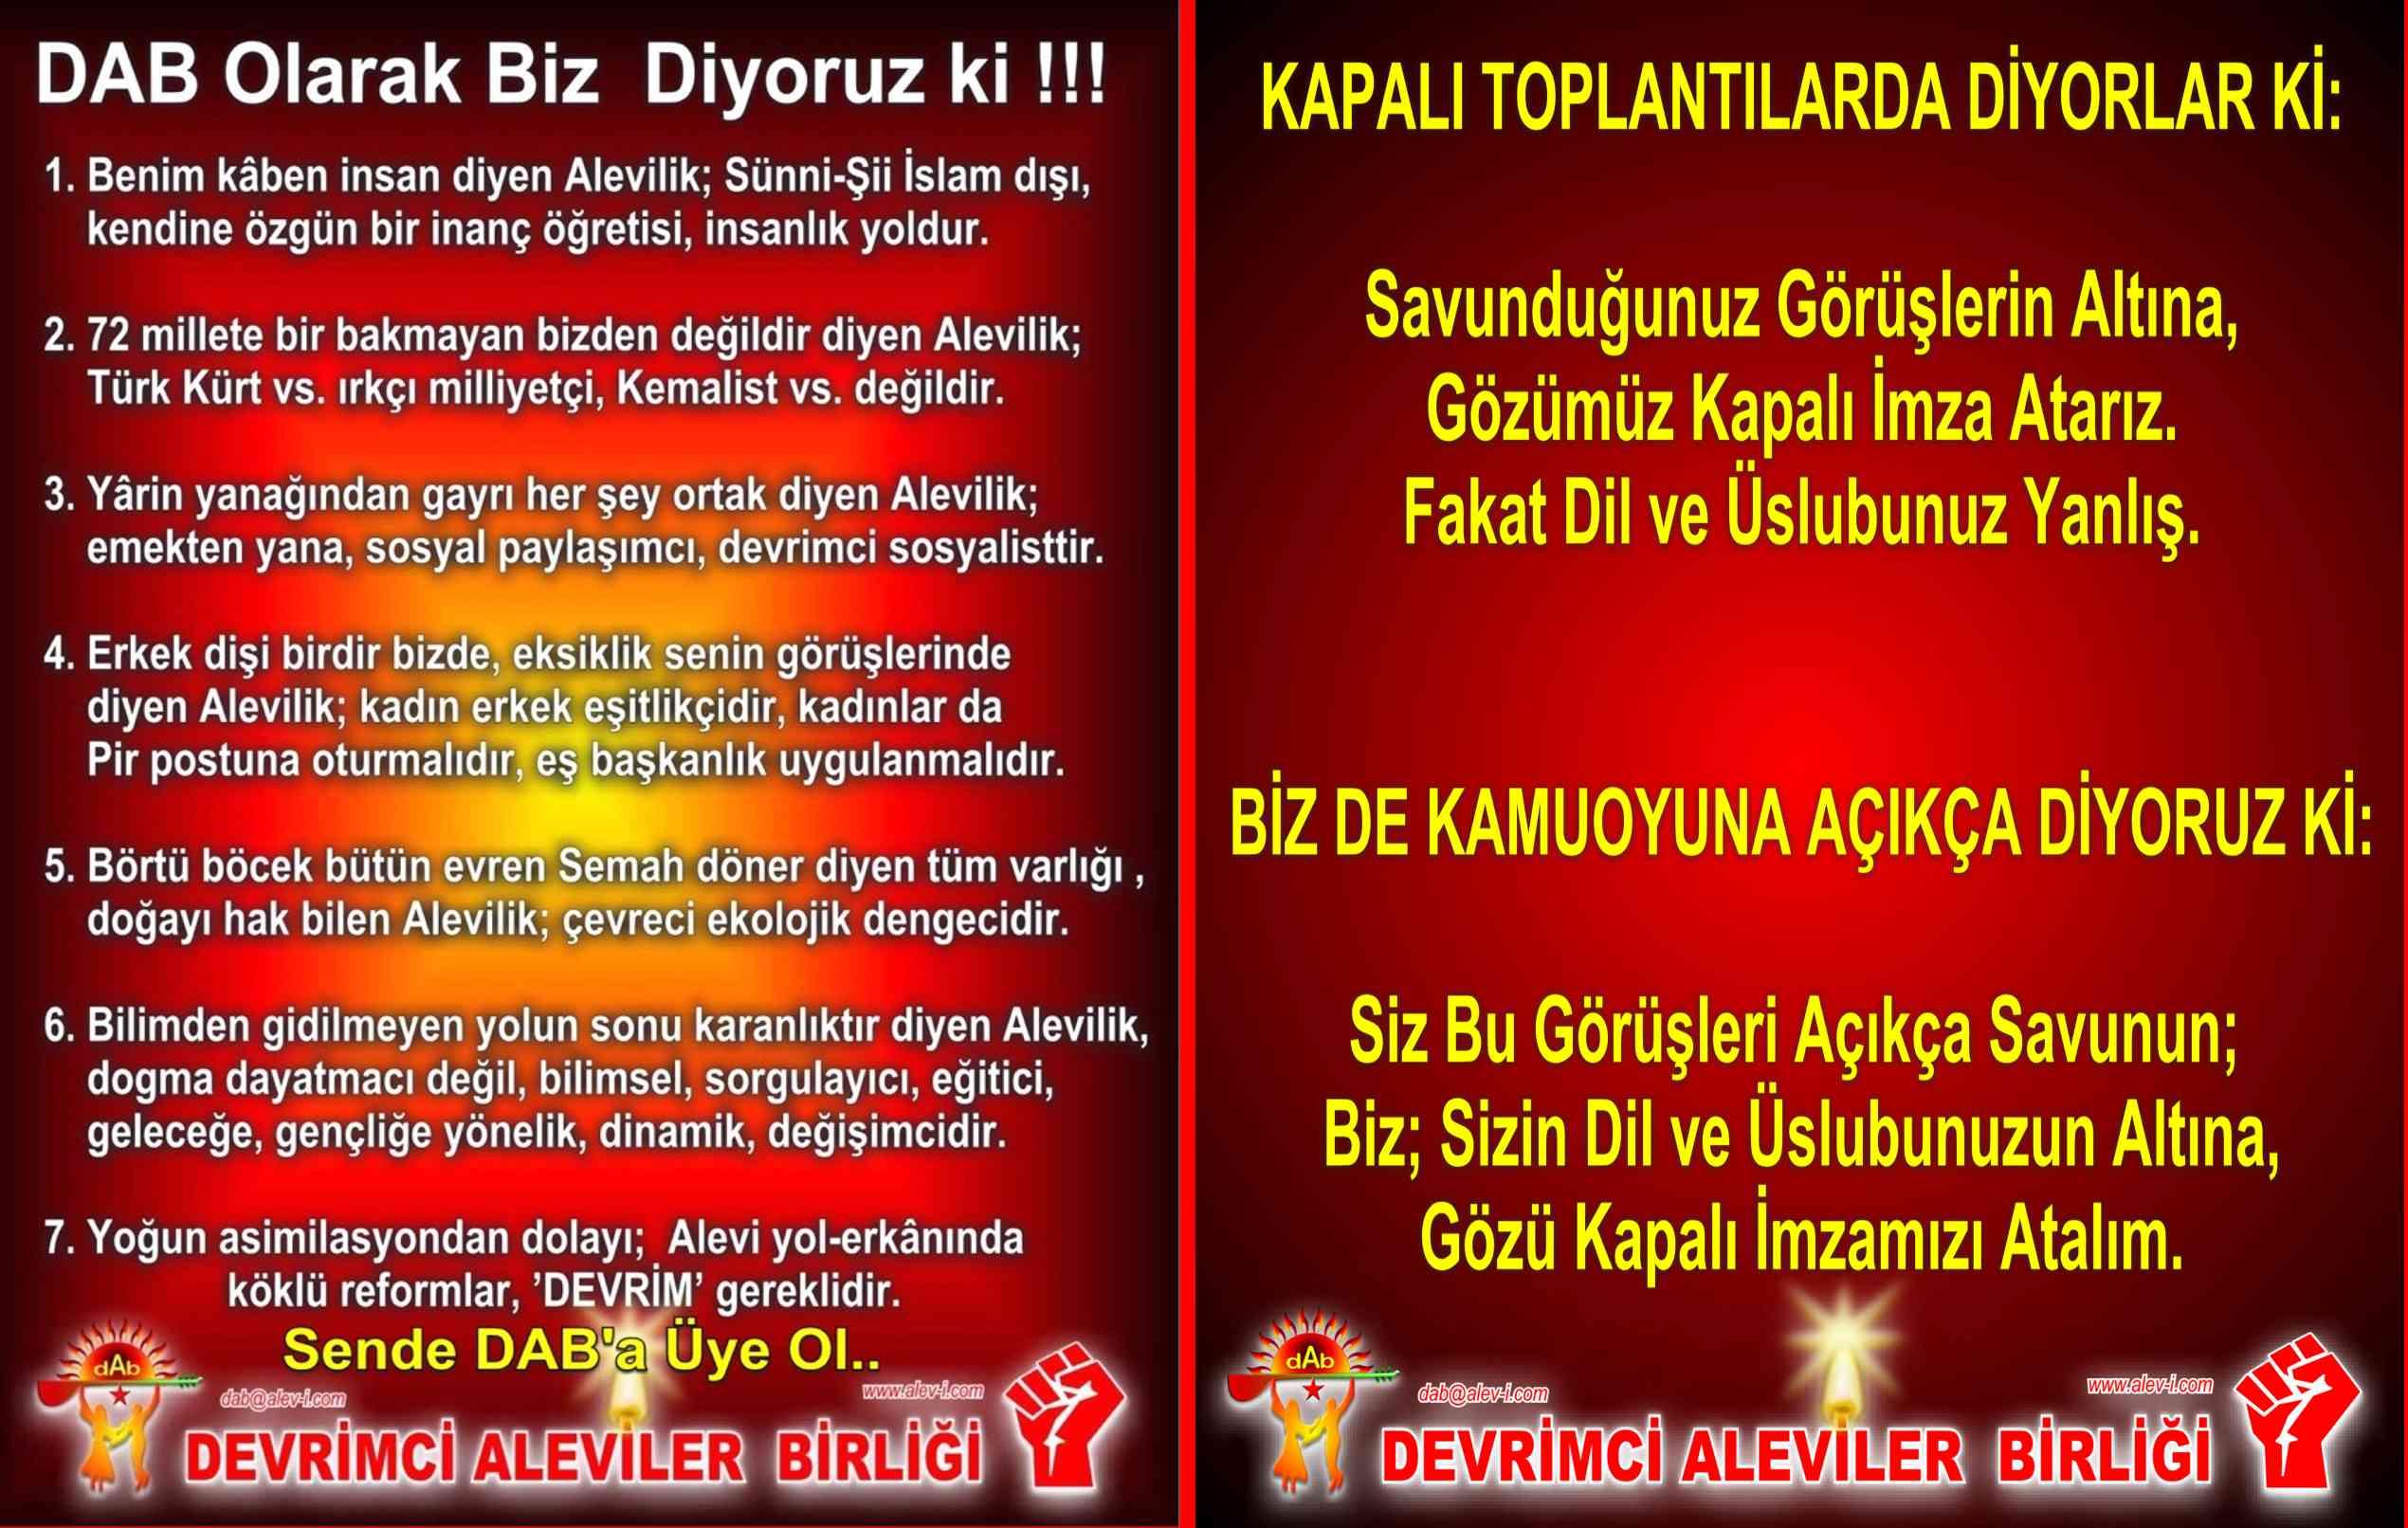 devrimci-aleviler-birligi-alevi-bektasi-kizilbas-pir-sultan-cem-imza-dab